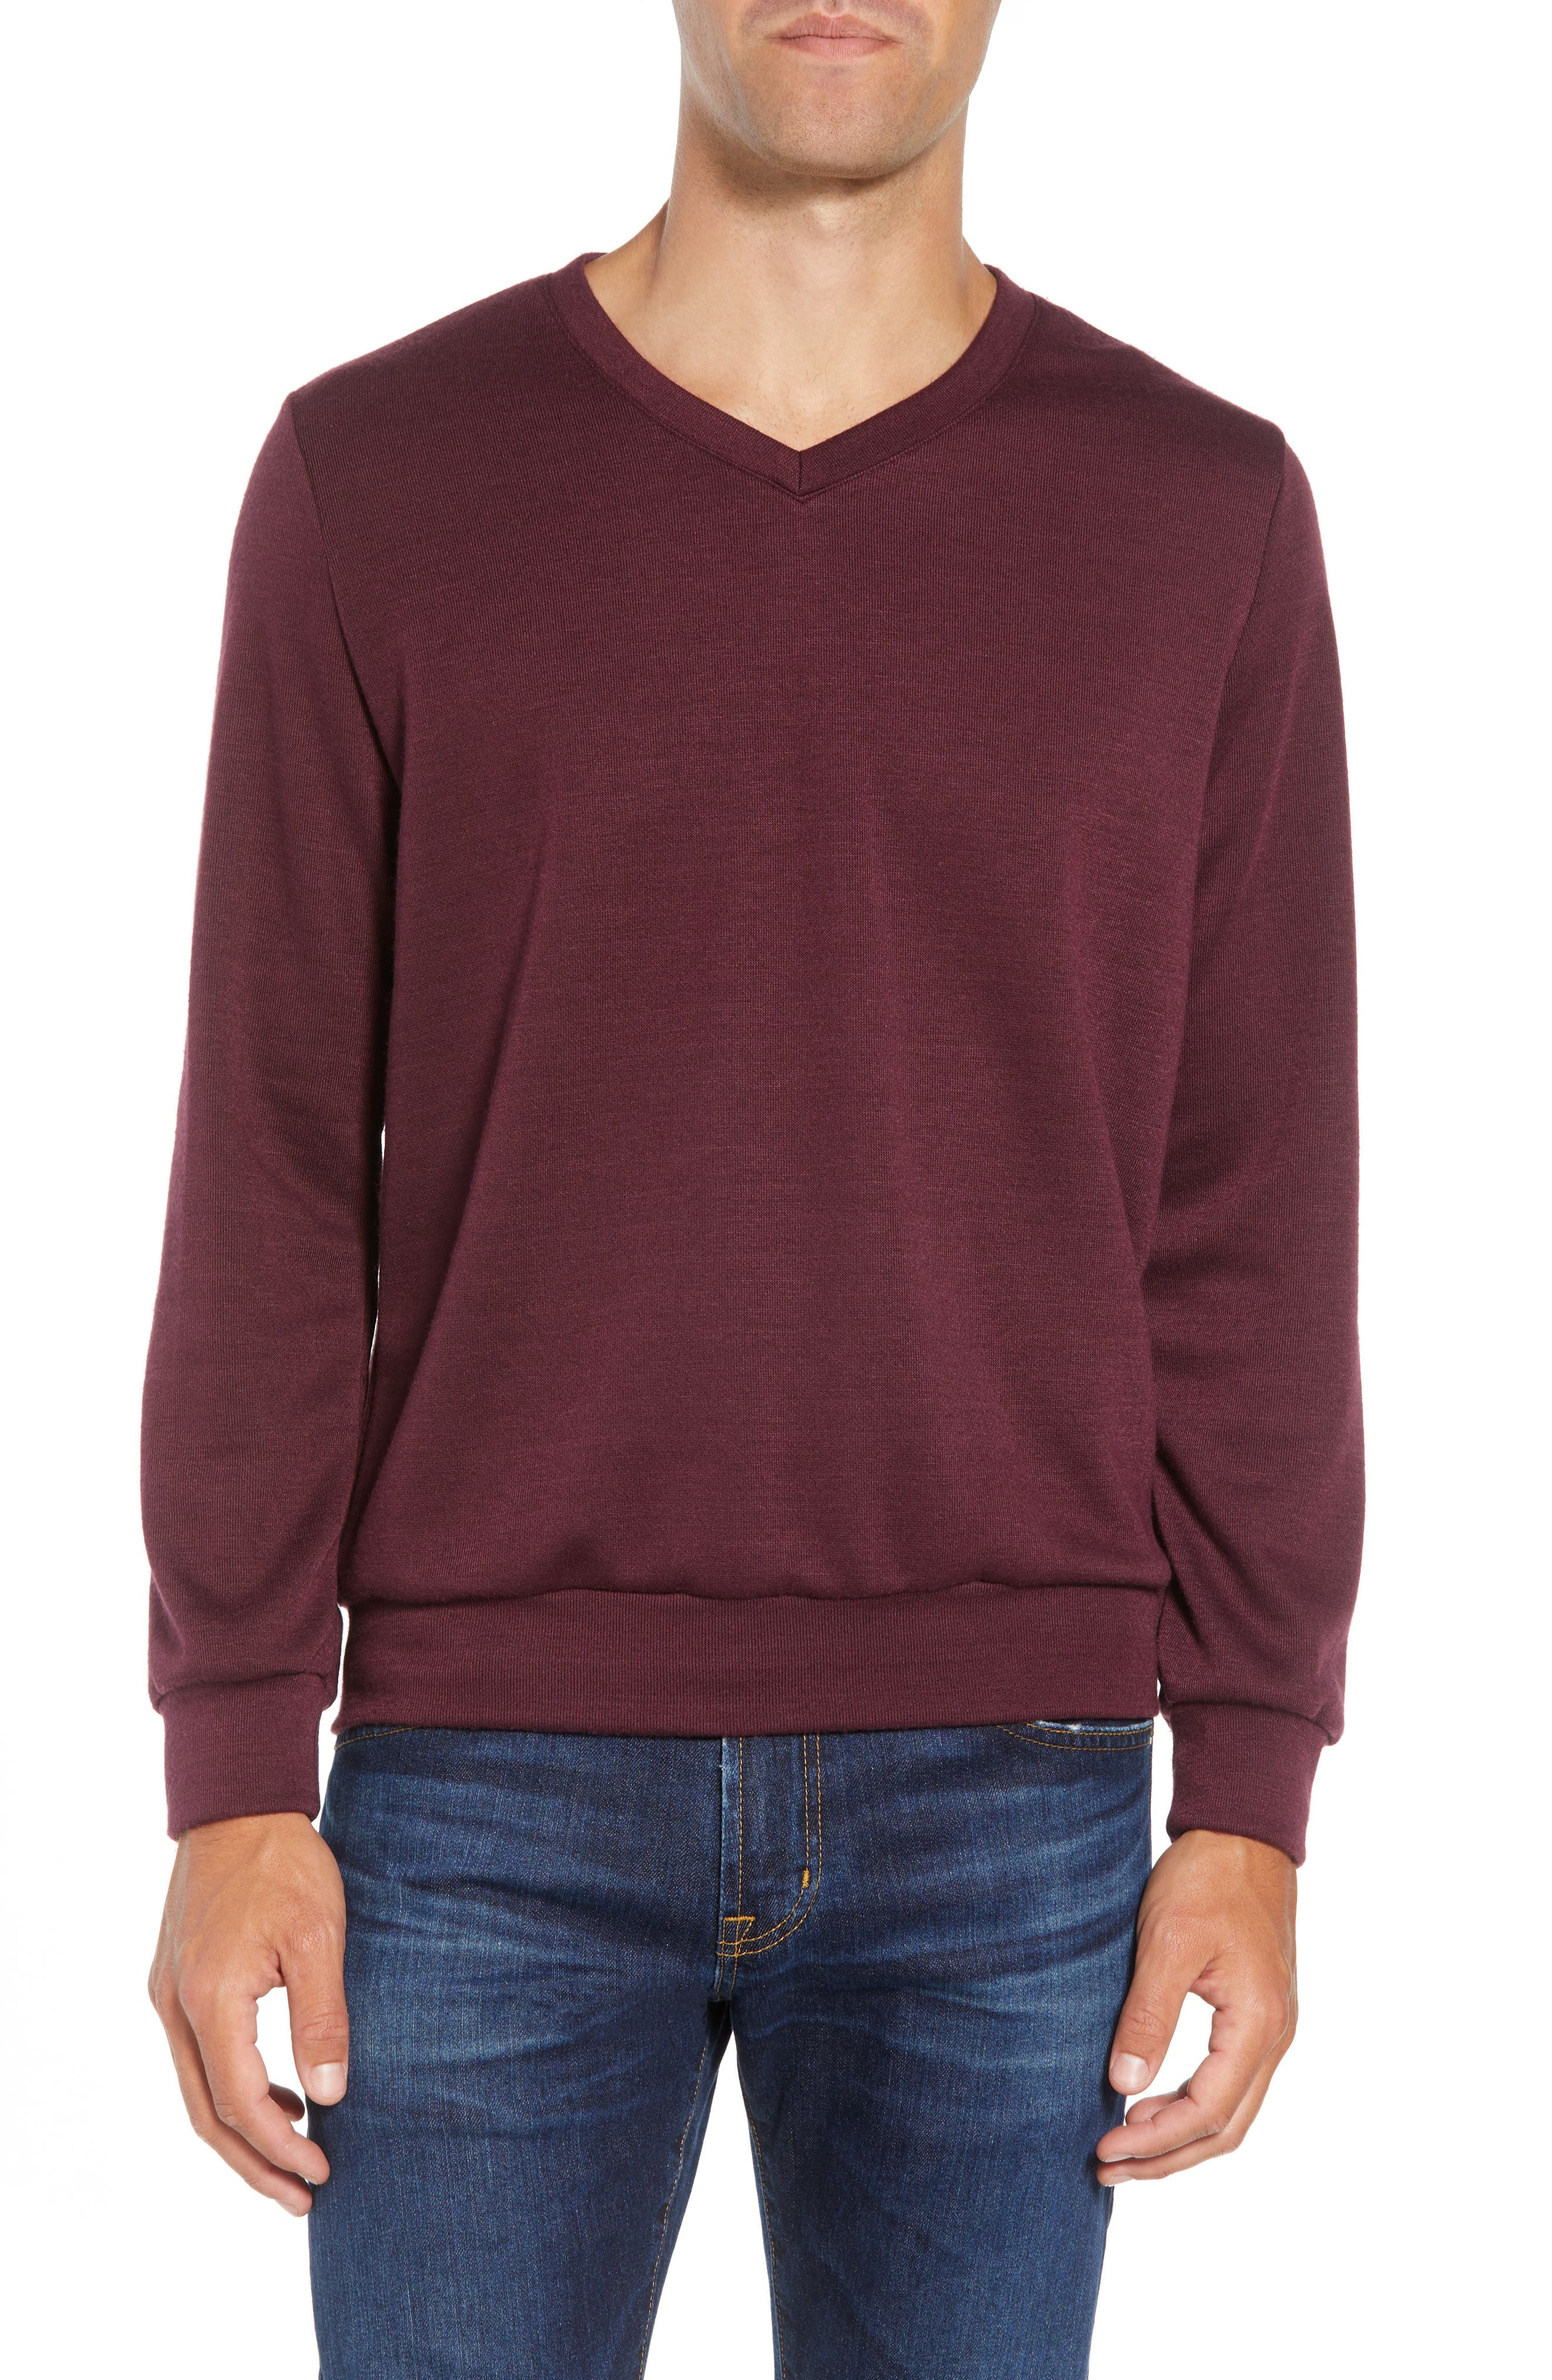 Pomerelle V-Neck Performance Sweater,                         Main,                         color, MERLOT